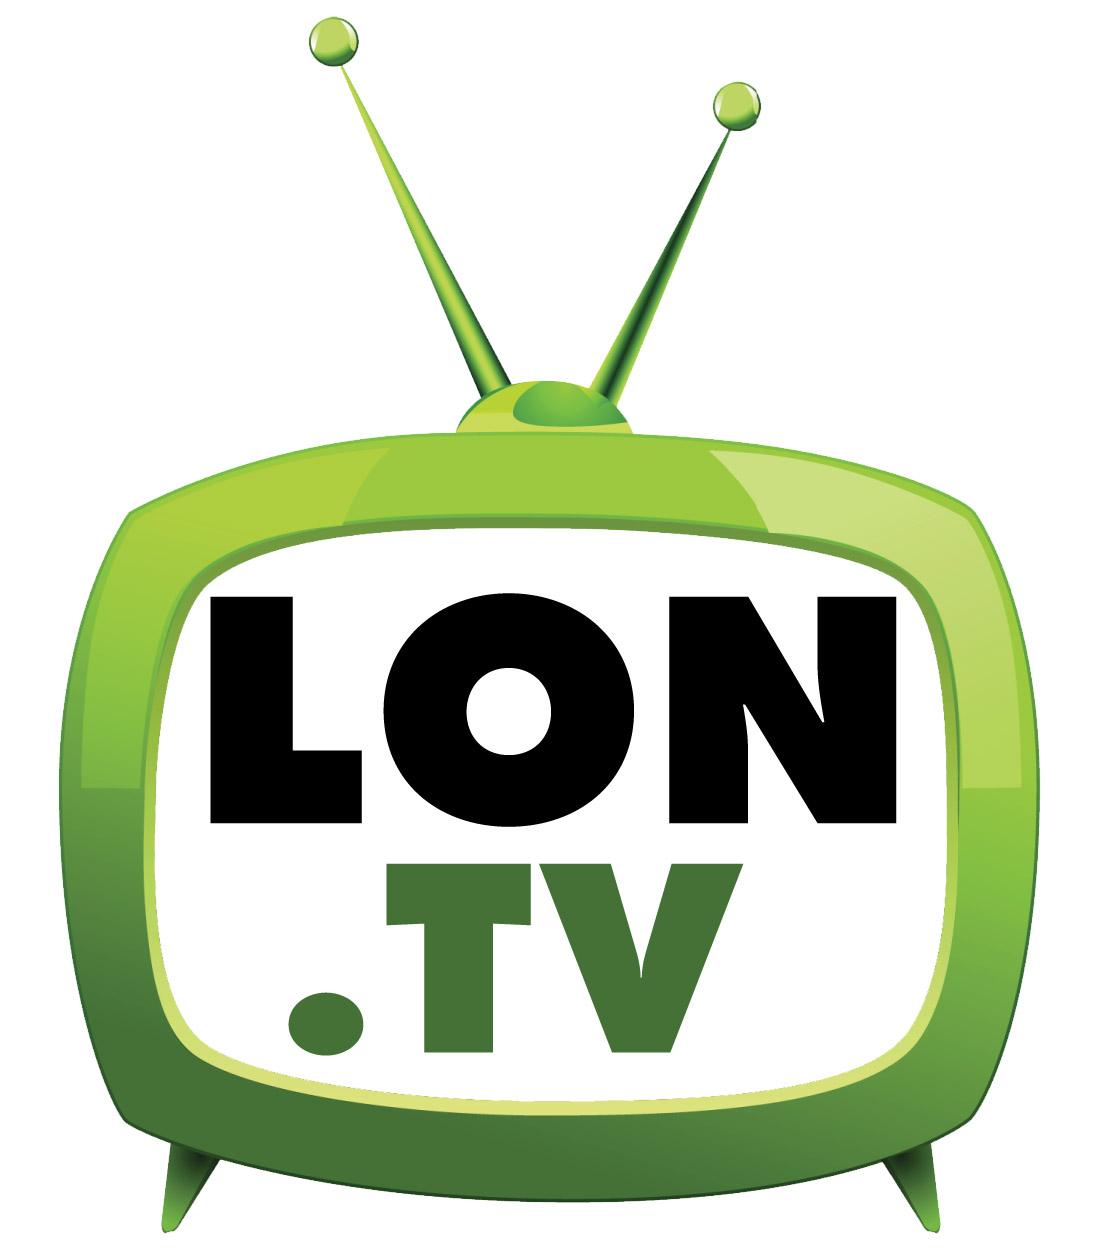 Lon.TV Store